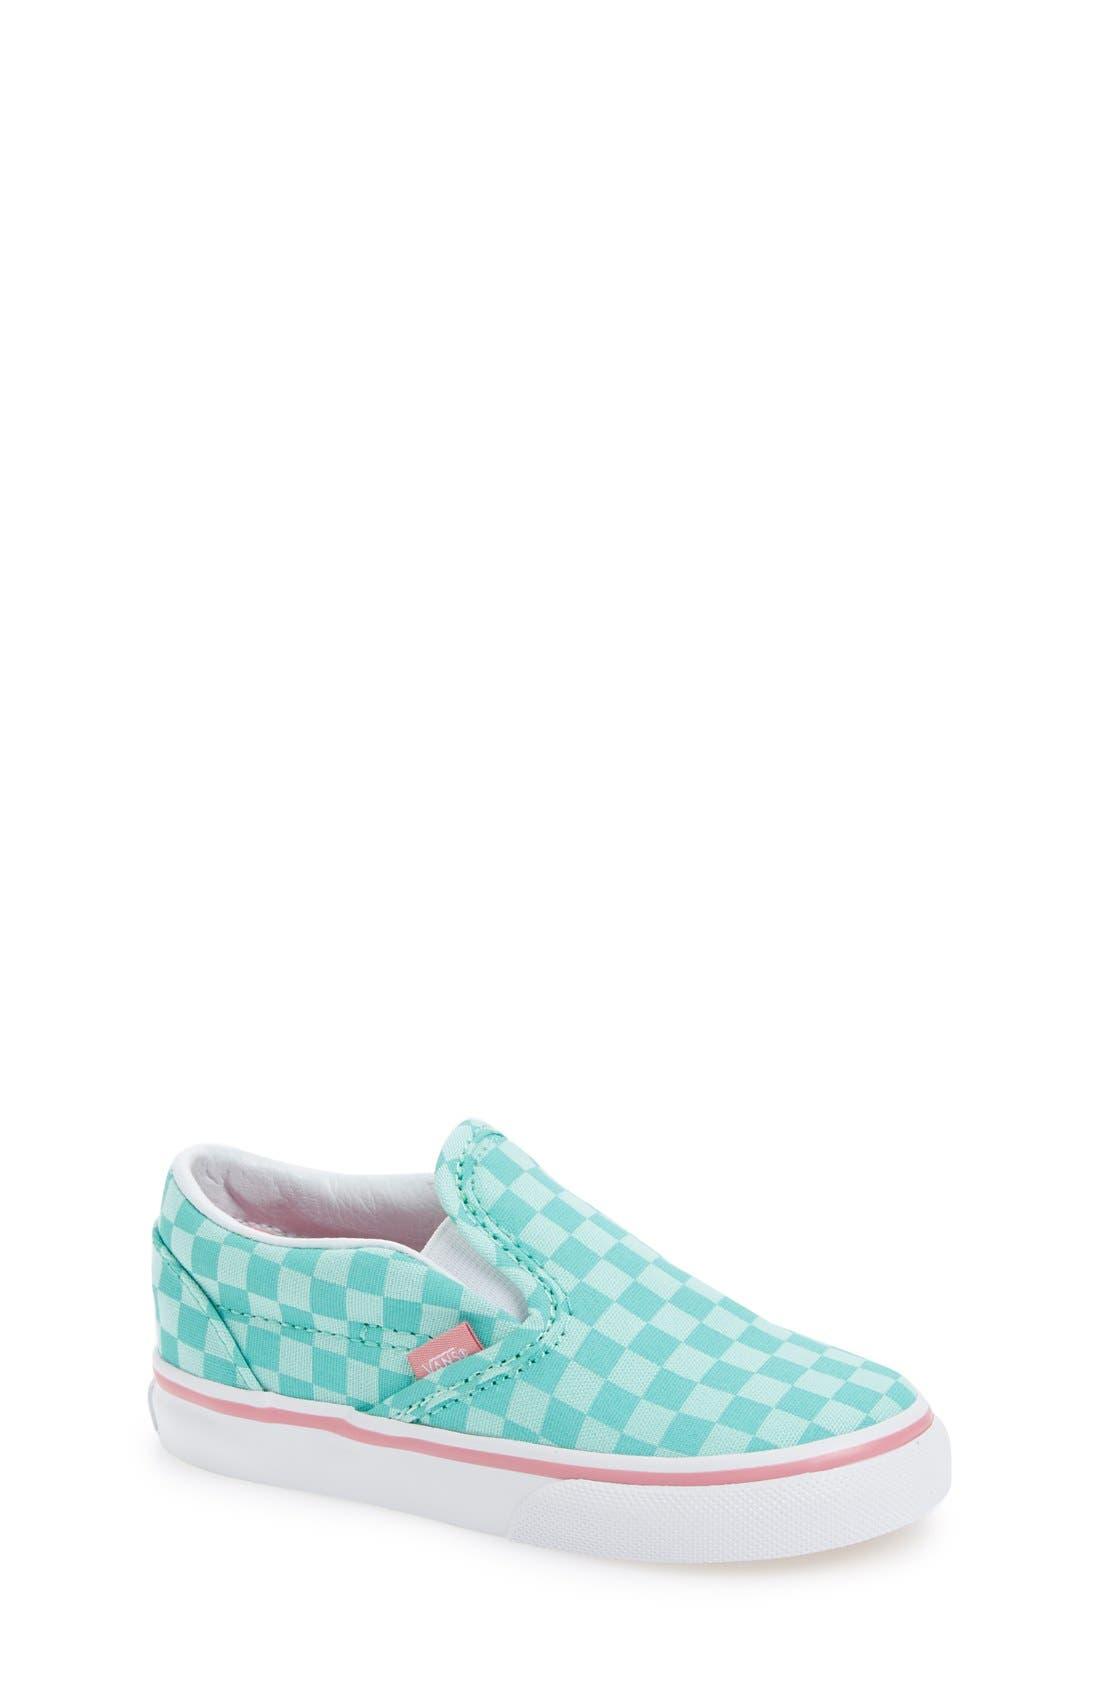 VANS,                             Classic Slip-On Sneaker,                             Main thumbnail 1, color,                             300